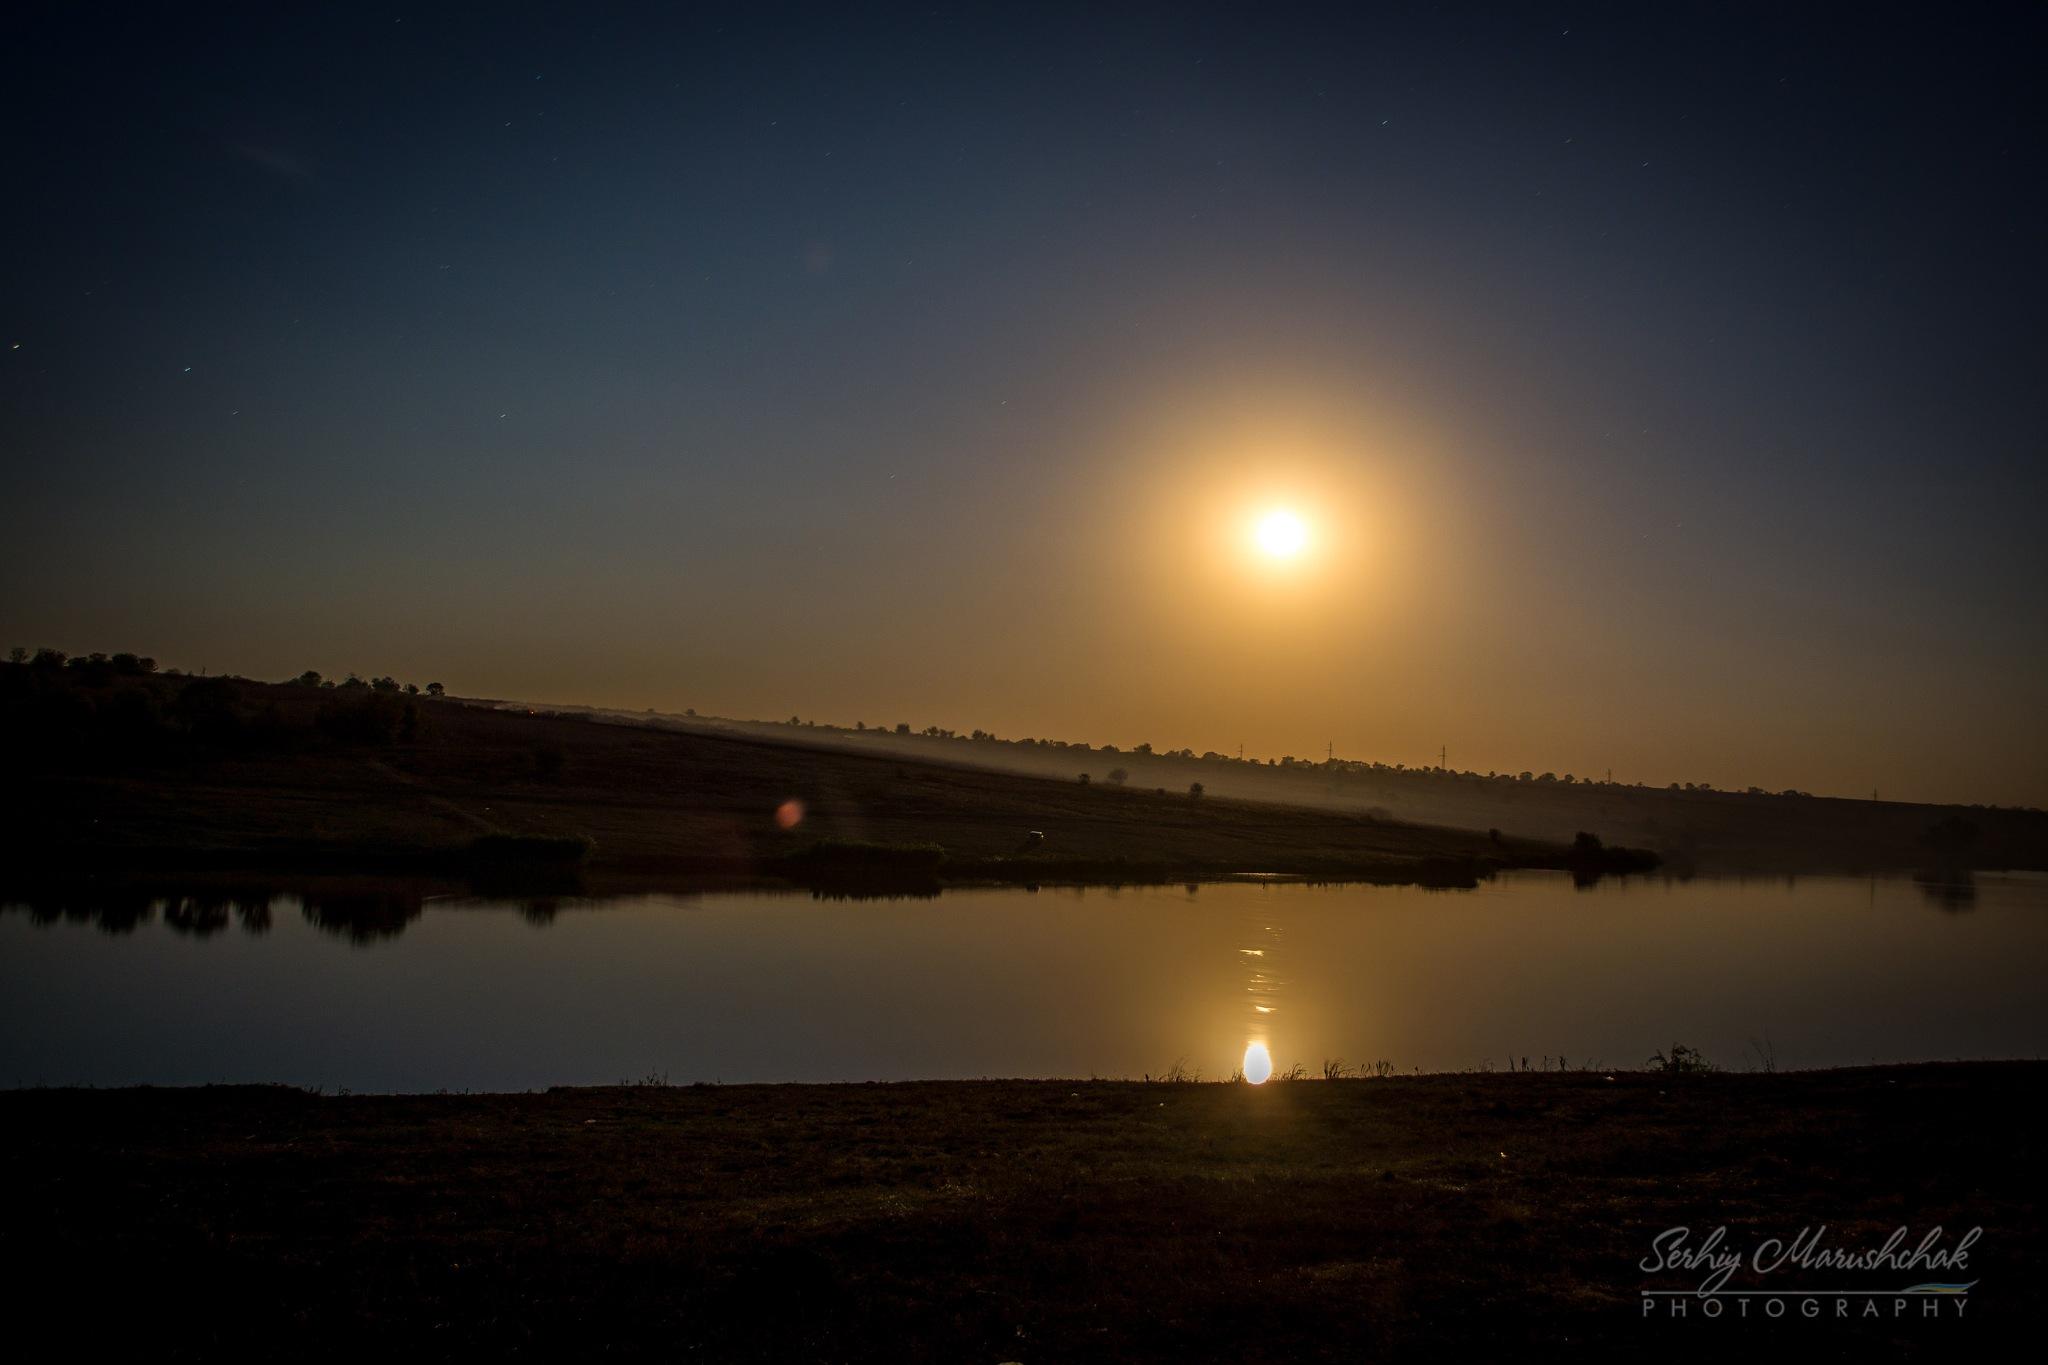 Нічний краєвид... / Night landscape... by artmars07